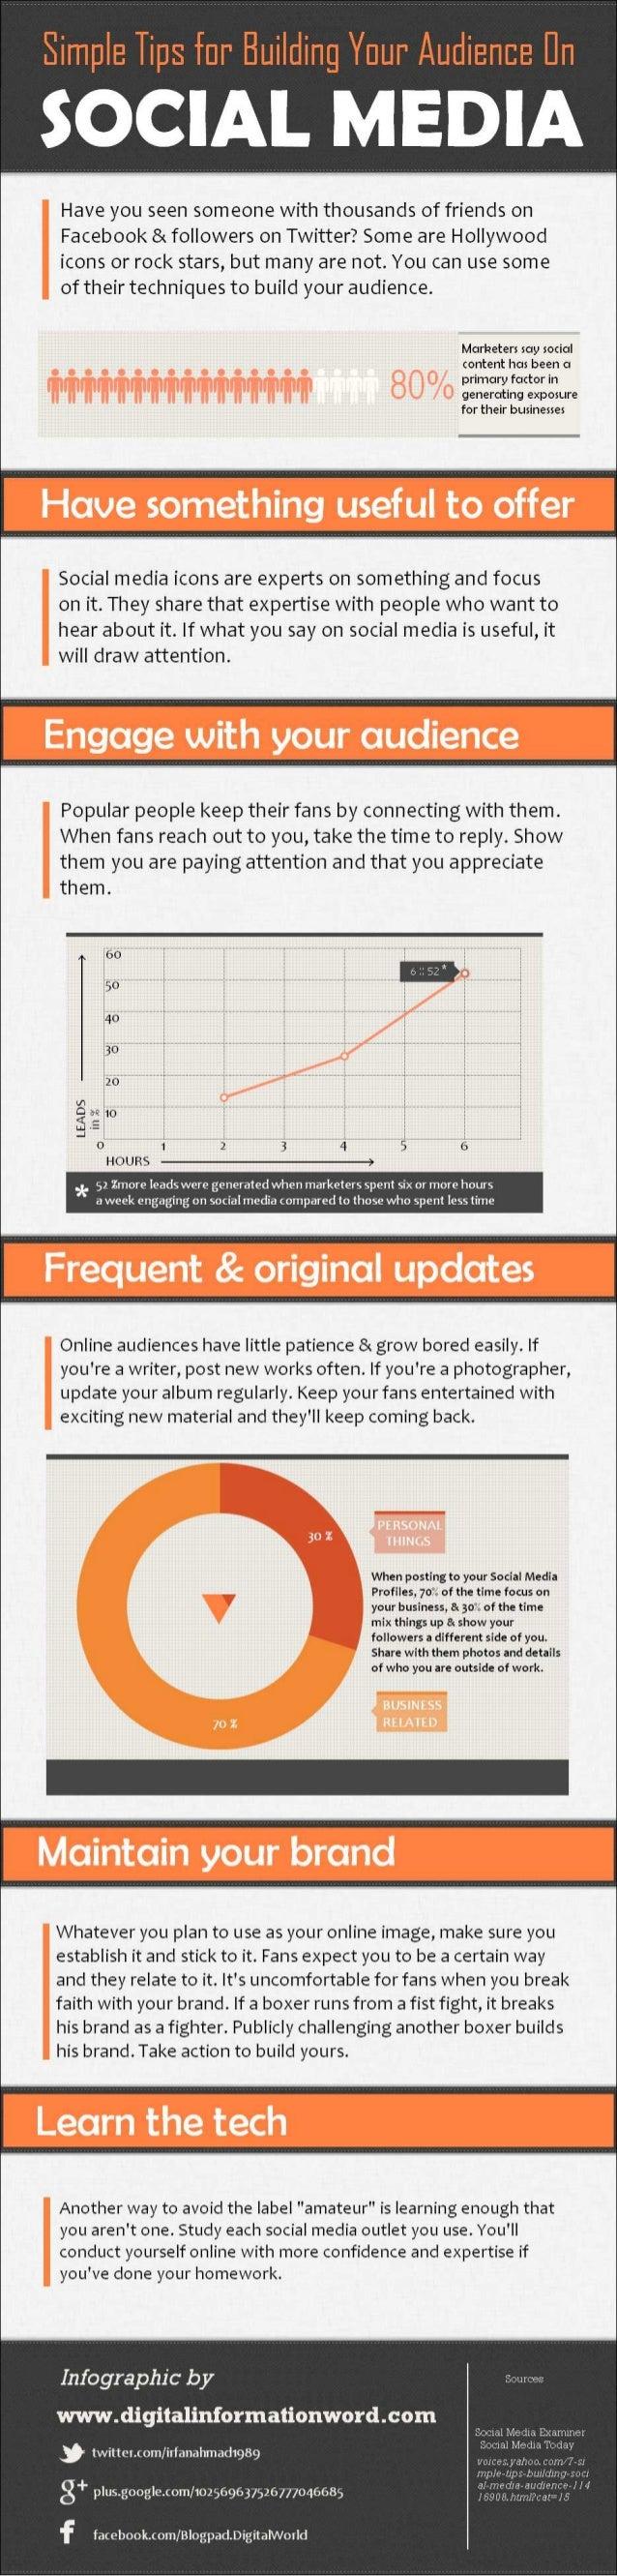 Simple strategies-for-building-audience-on-social-media